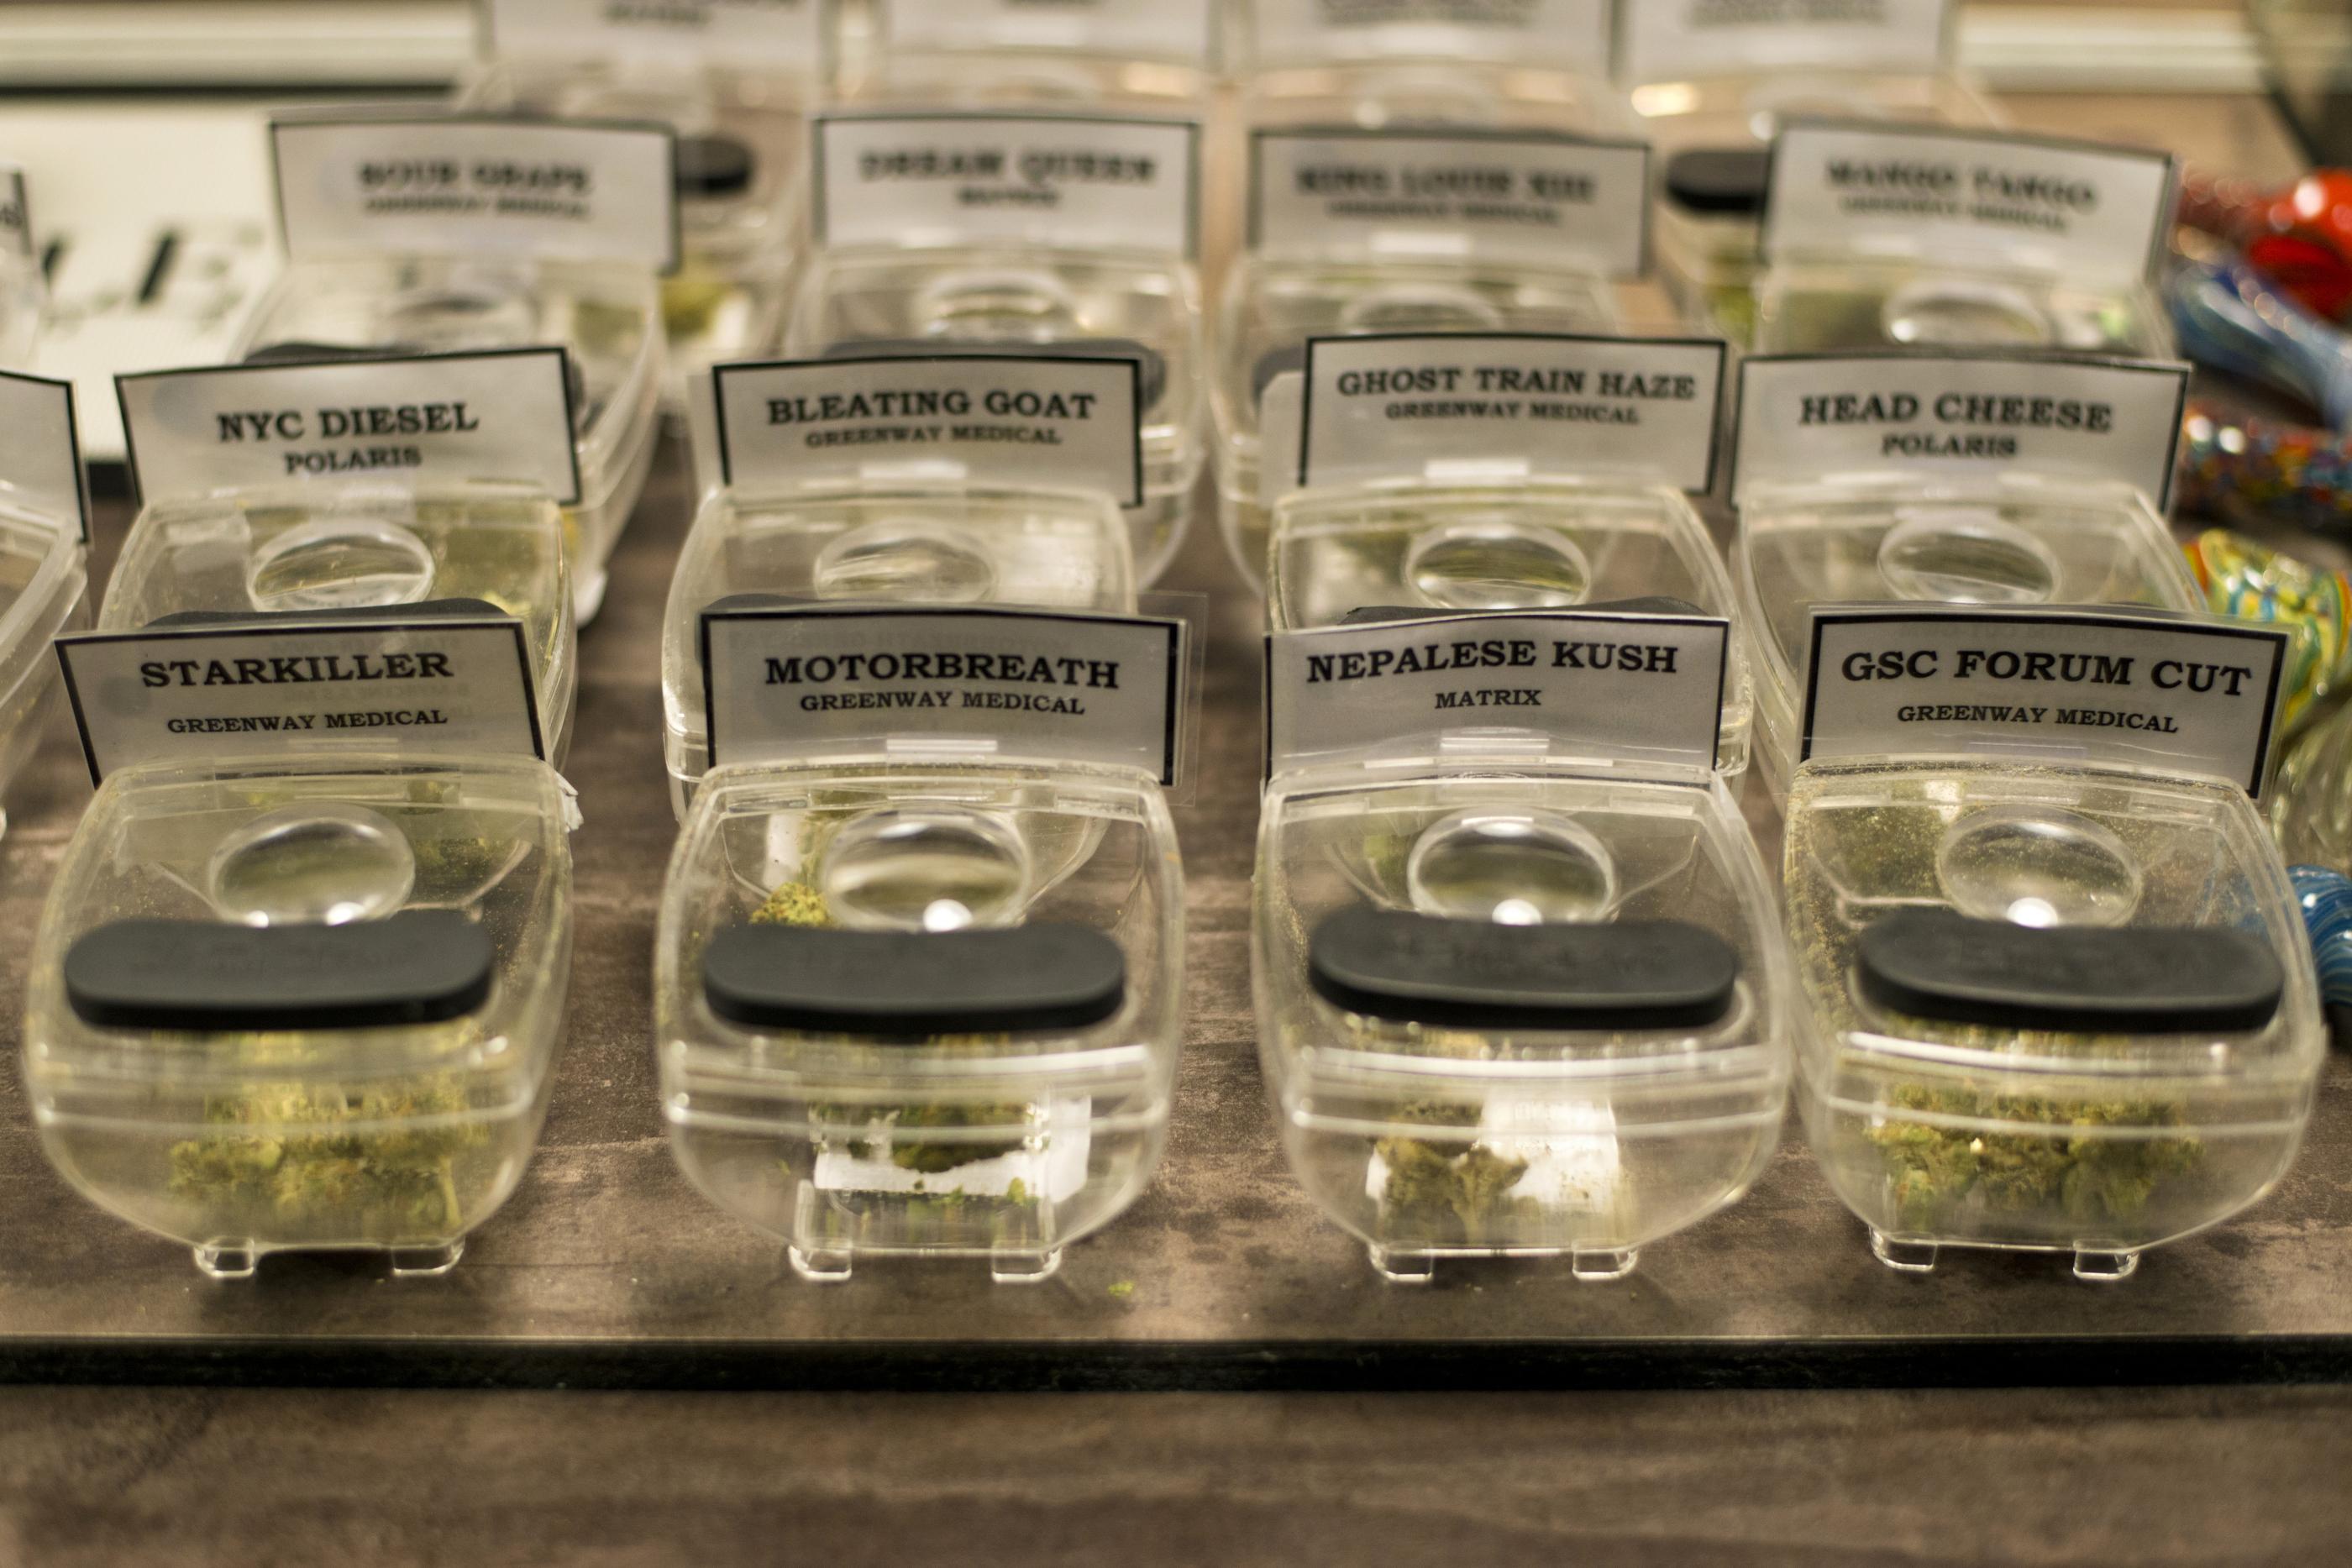 Marijuana samples